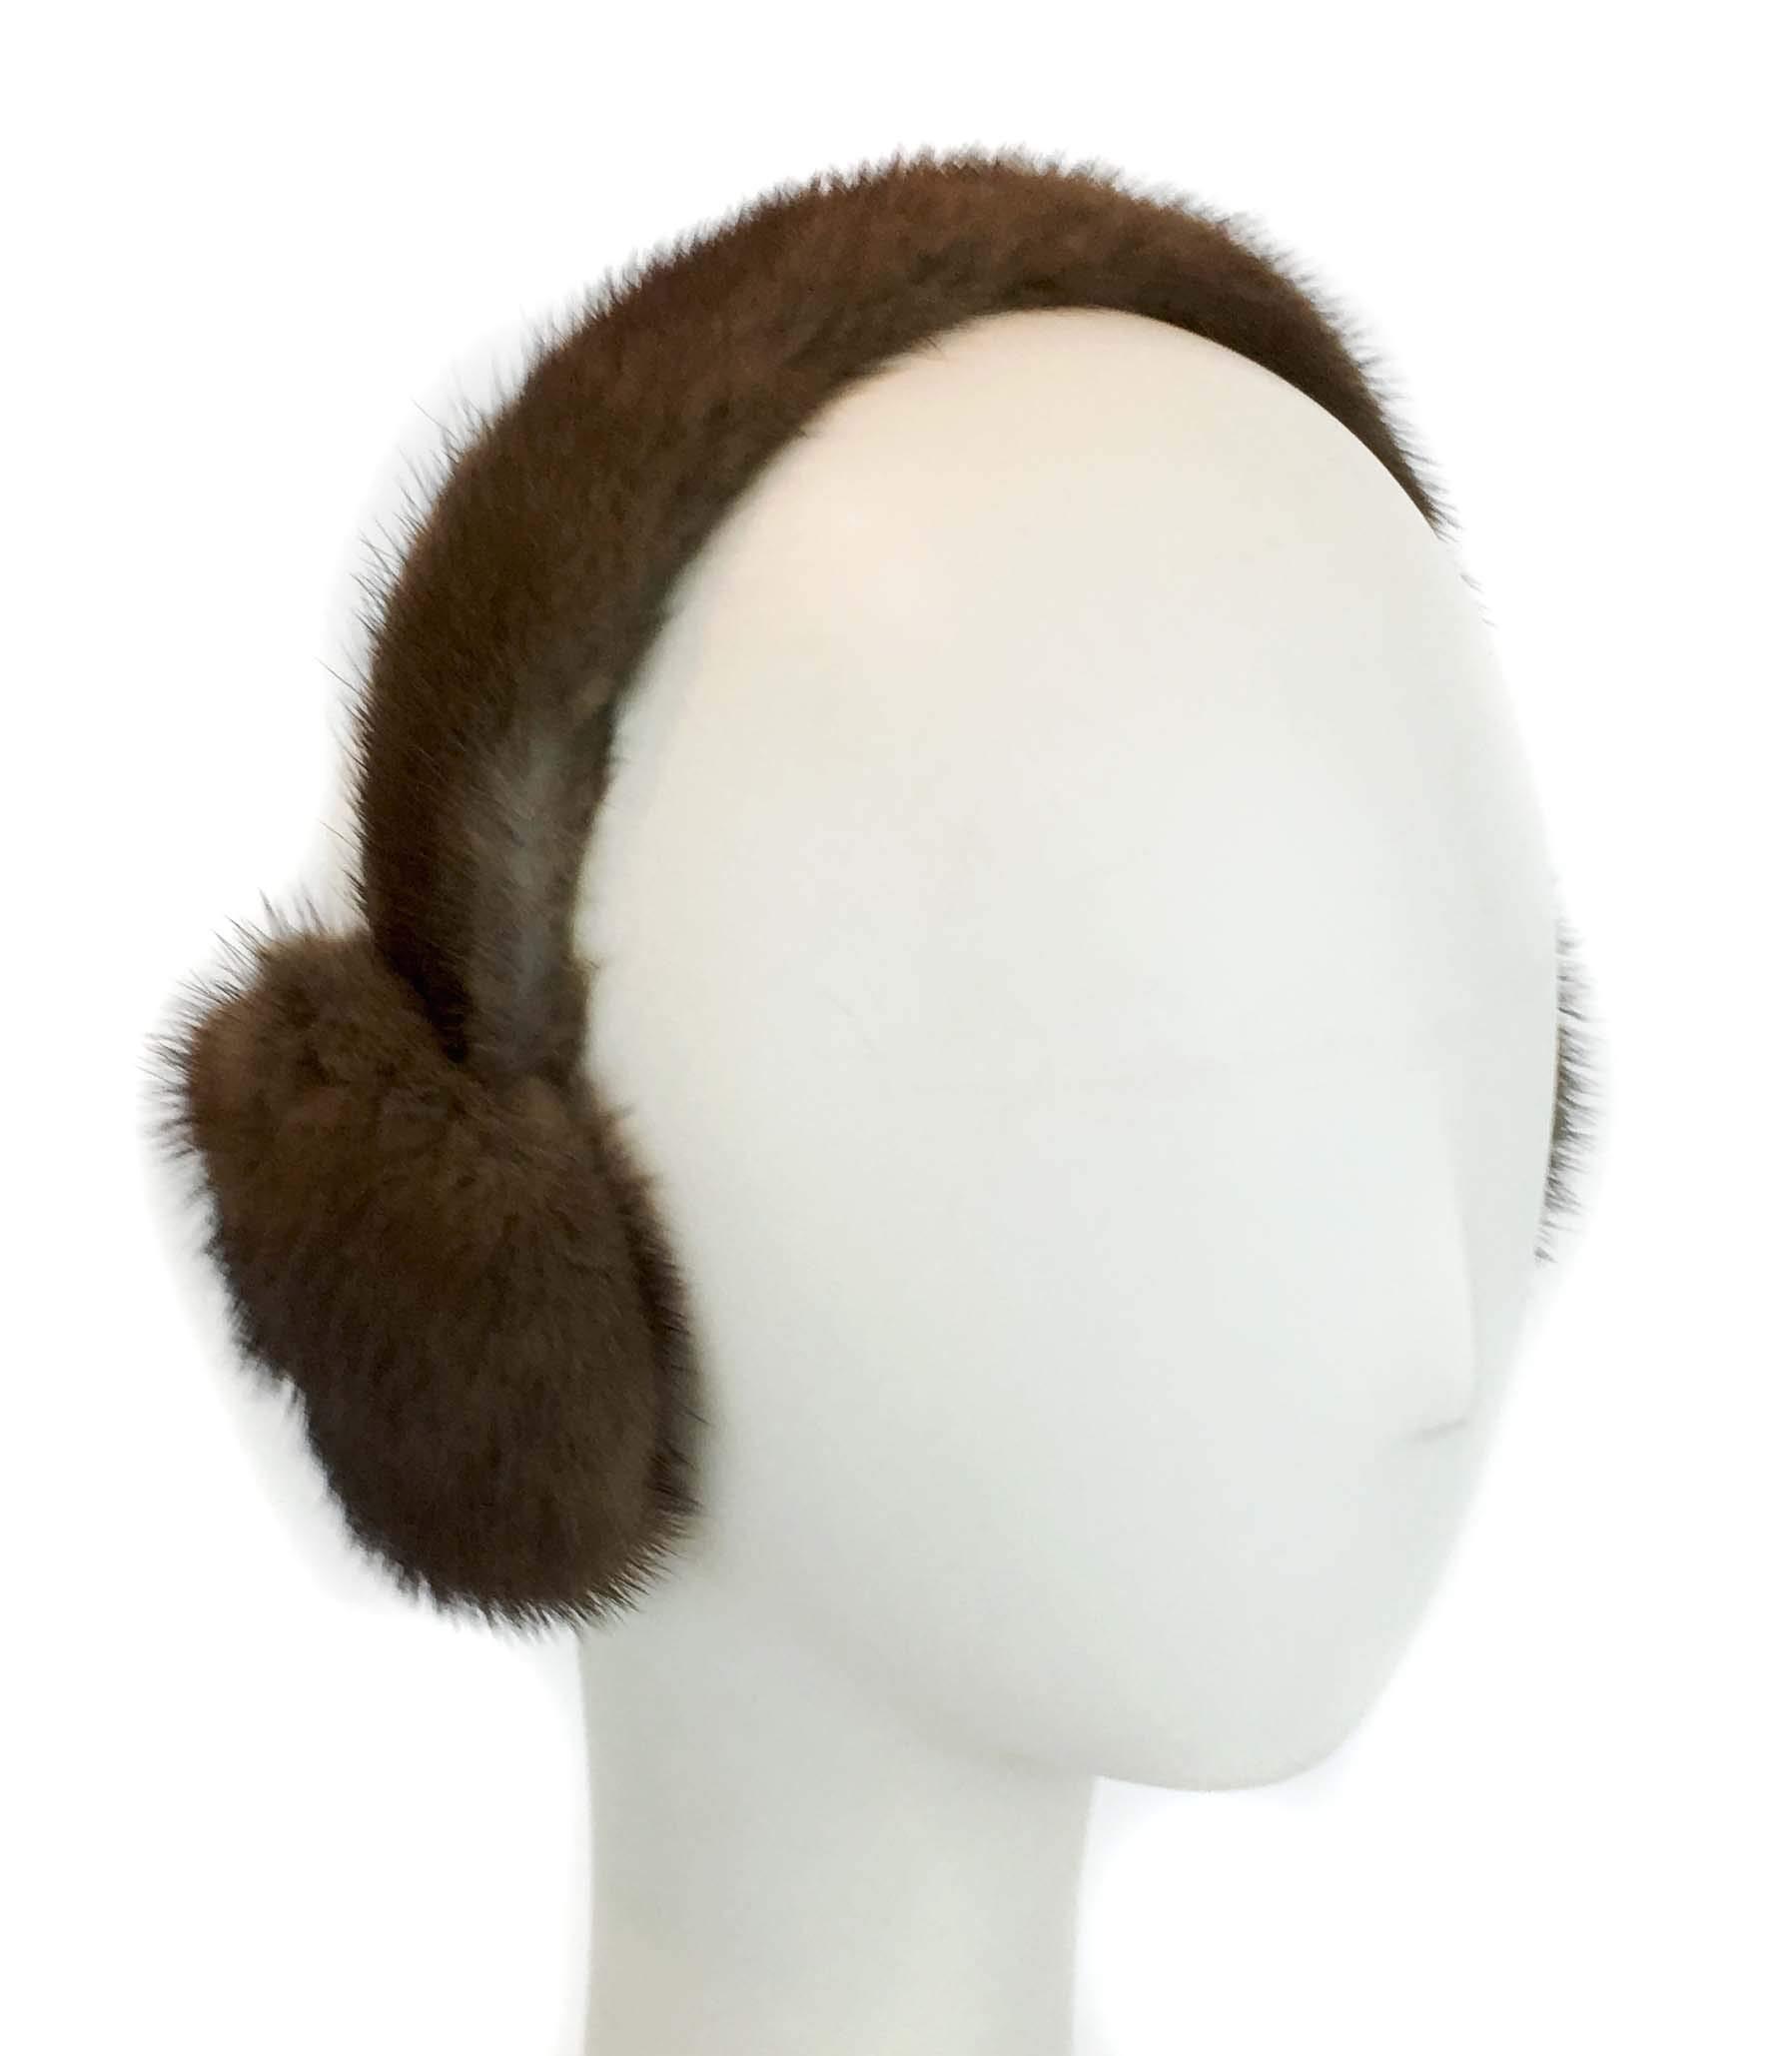 Surell Mink Earmuff with Fur Halo Band - Winter Ear Muffs - Cold Weather Fashion (Luna Brown)